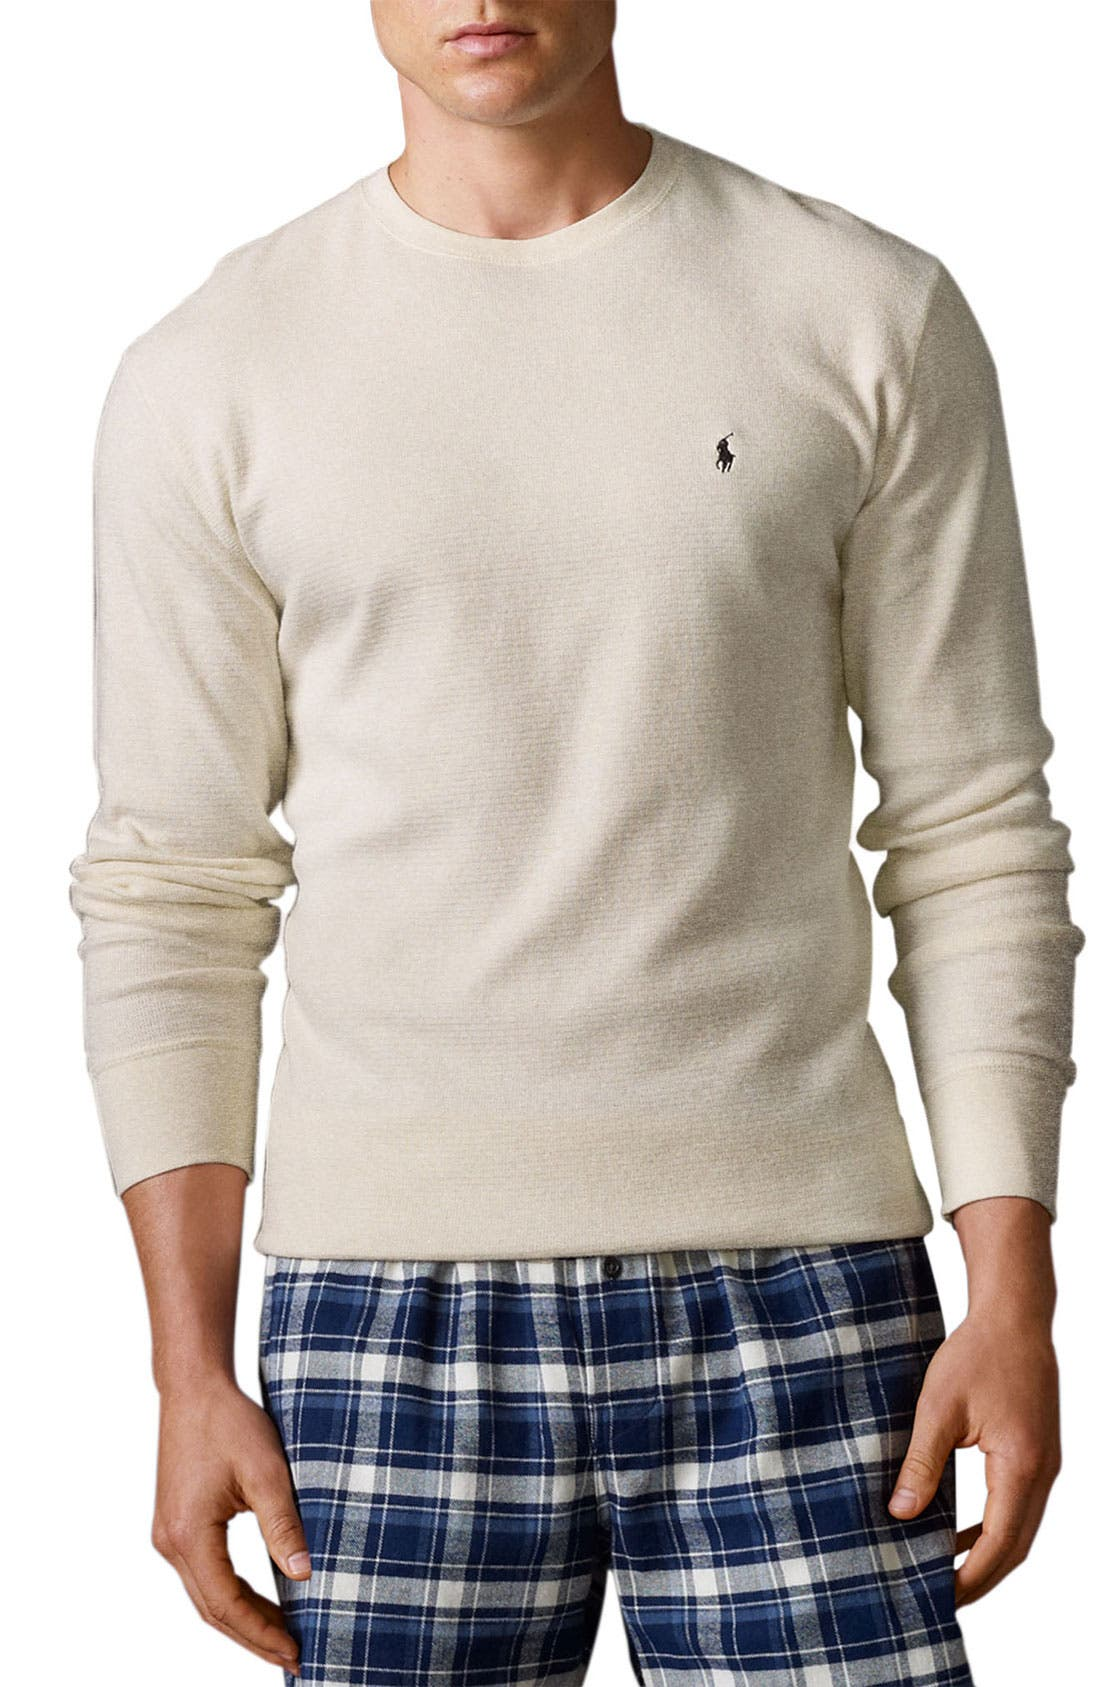 Main Image - Polo Ralph Lauren Thermal Crewneck Lounge Shirt